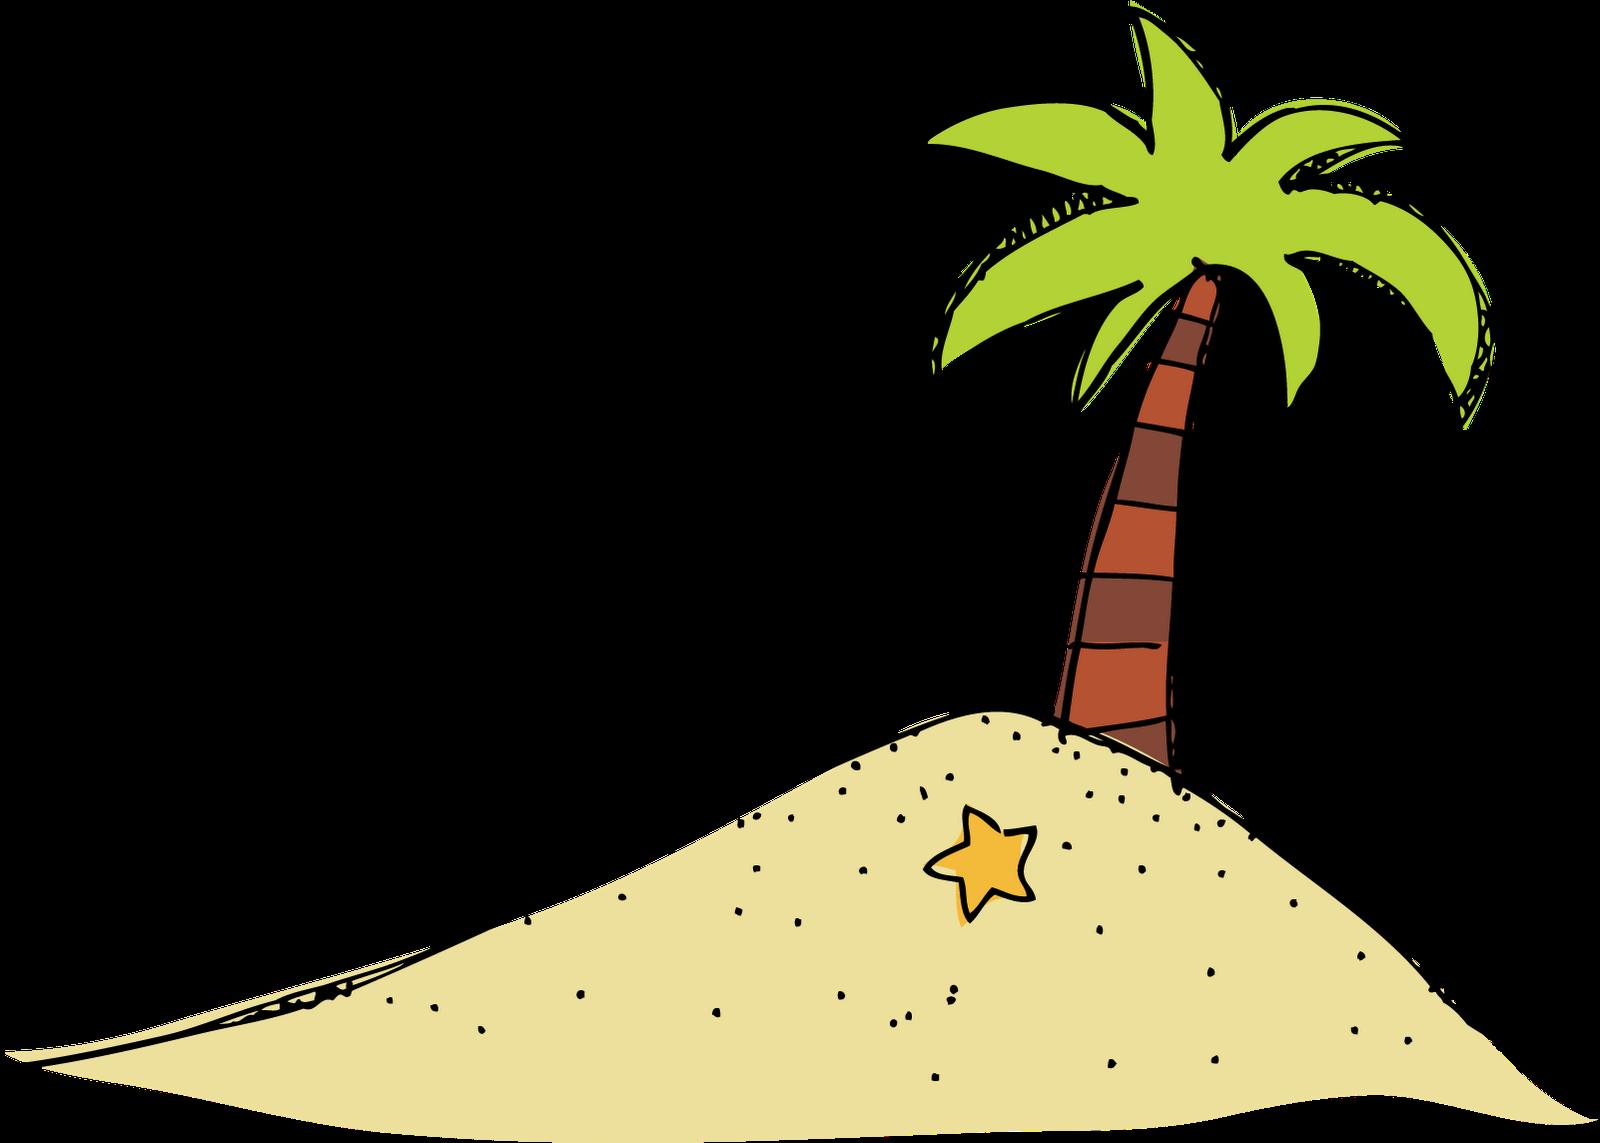 Island Clipart & Island Clip Art Images.